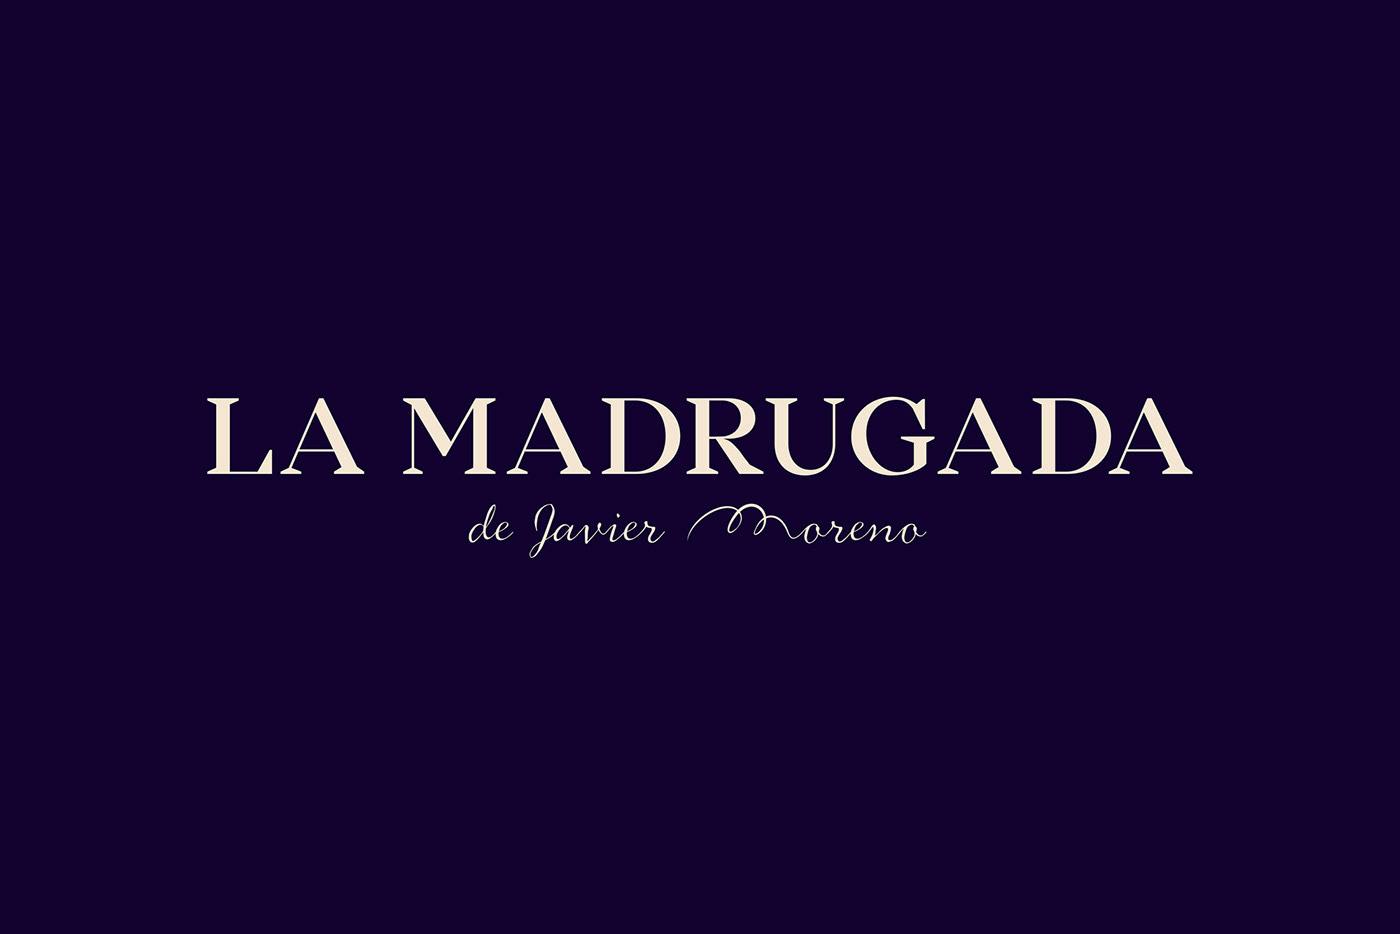 LA MADRUGADA branding by Rubio & del Amo